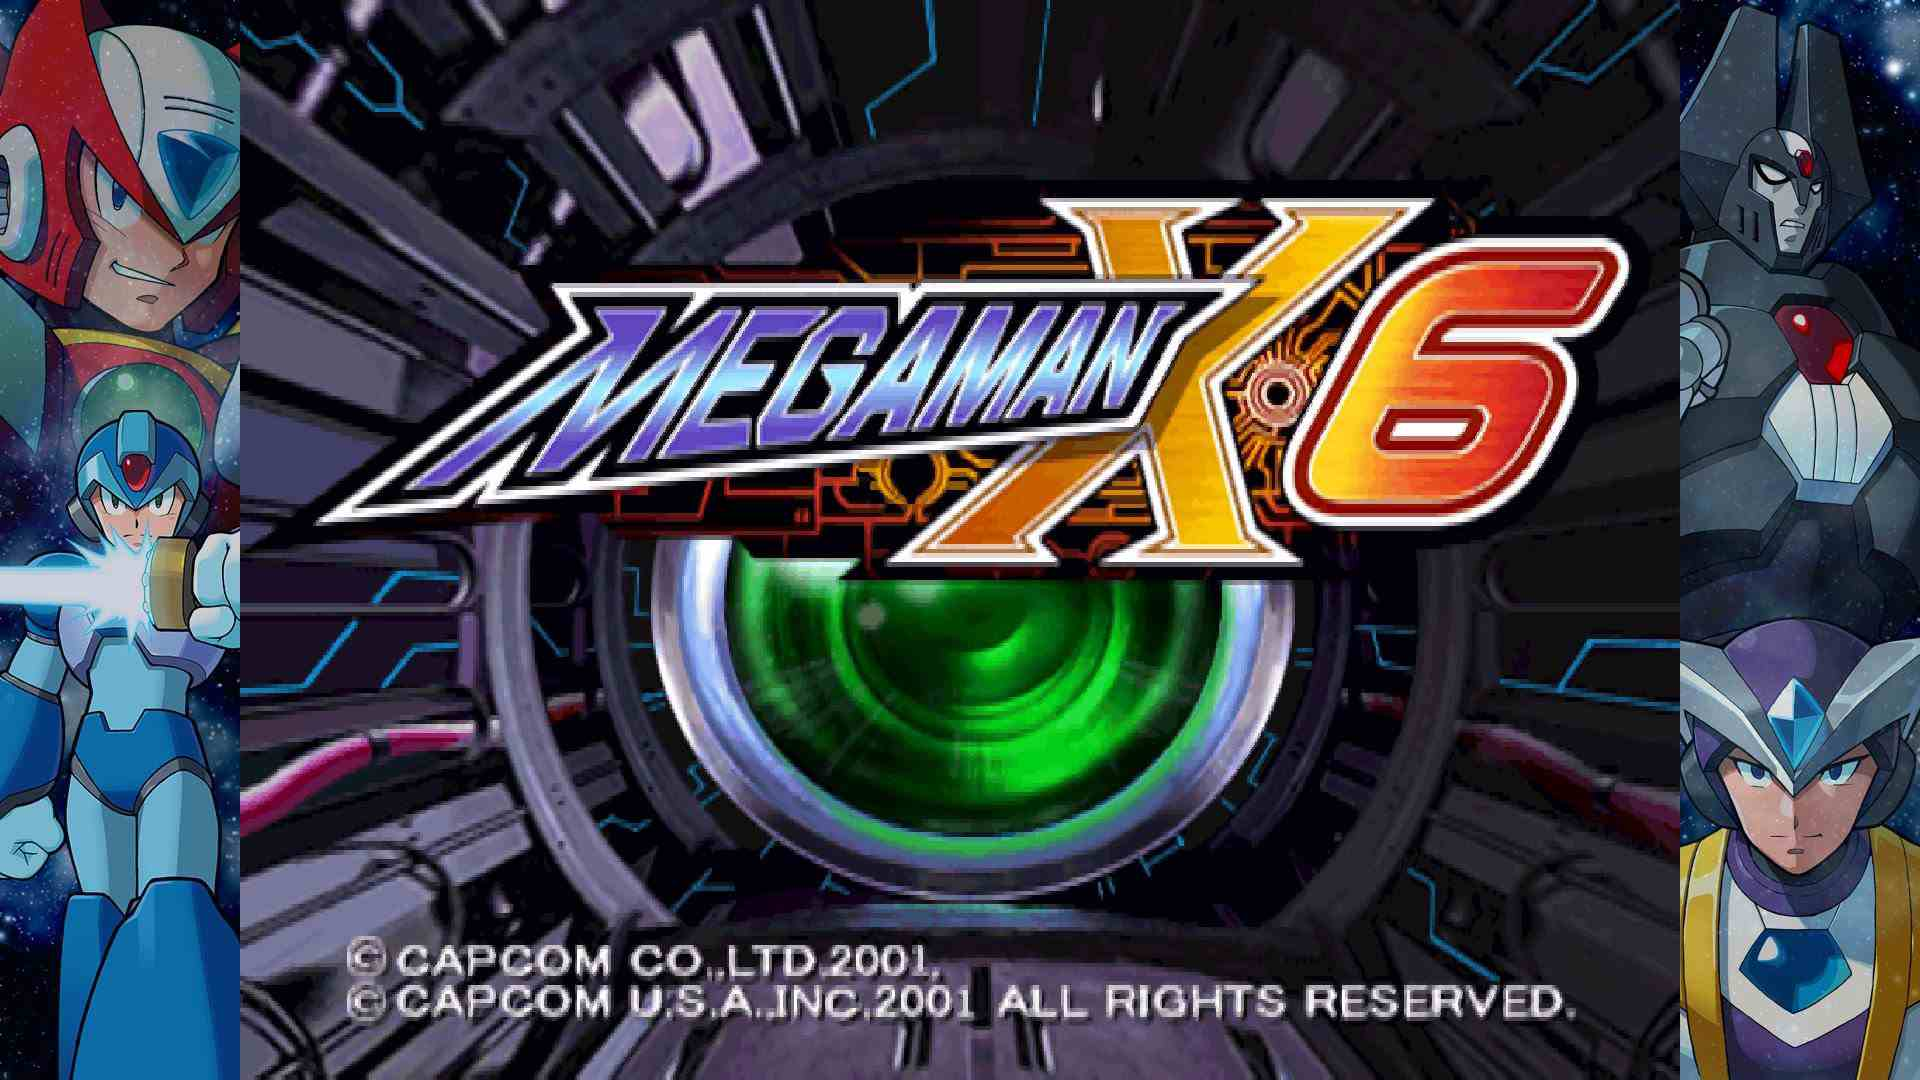 Mega Man X6 was released for multiple platforms in 2001.